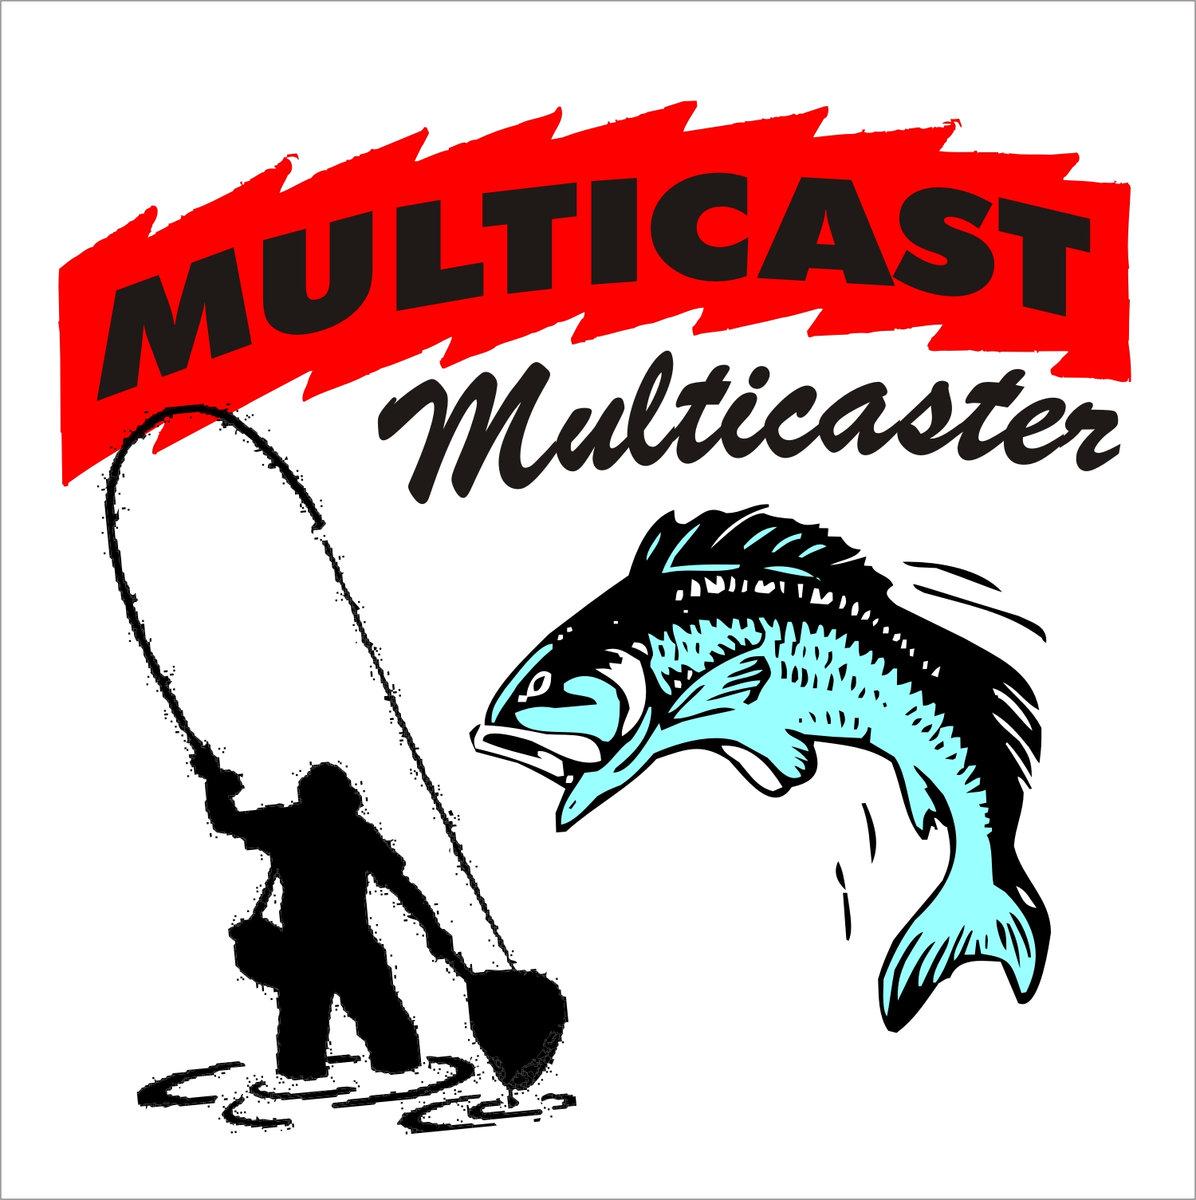 Multicaster.